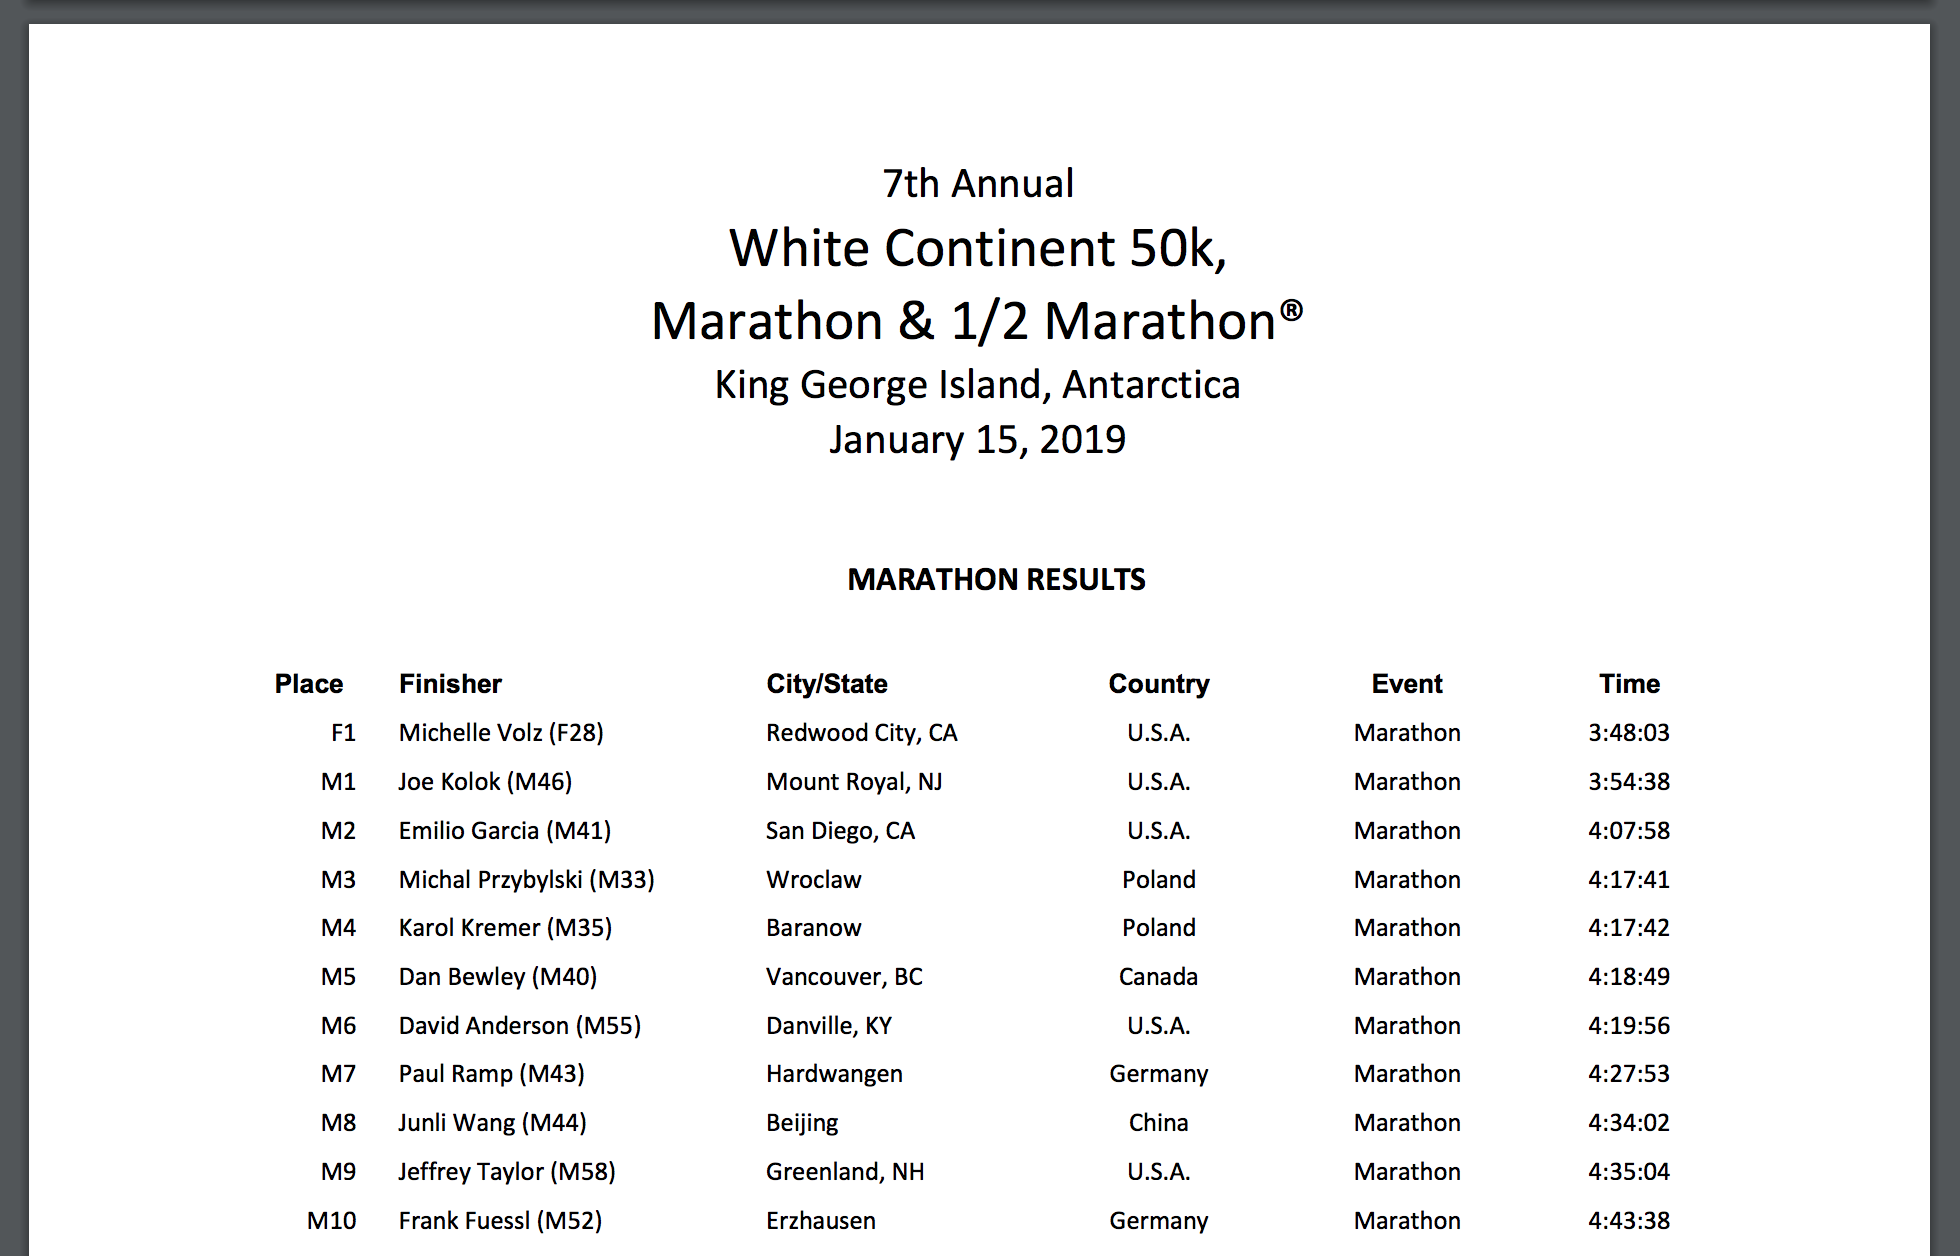 White Continent Marathon Results 2019